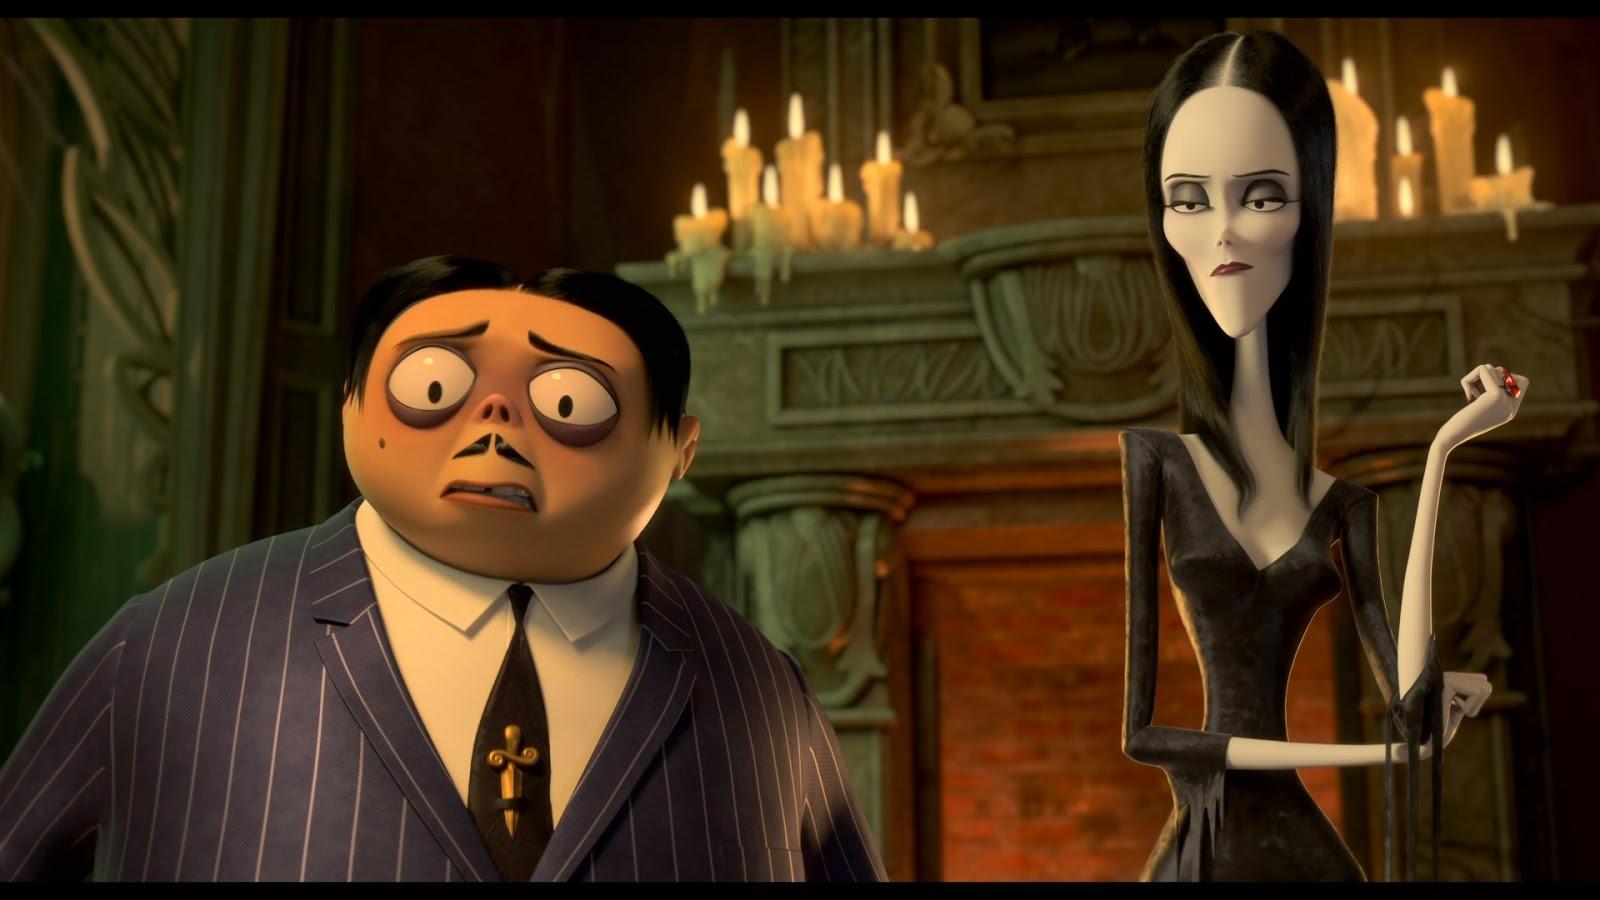 La+familia+Addams+%282019%29+1080p+BDRemux+Latino+-+Ingles+-+Descargatepelis.com.mkv_snapshot_00.47.25_%5B2020.01.11_11.09.12%5D.jpg (1600×900)